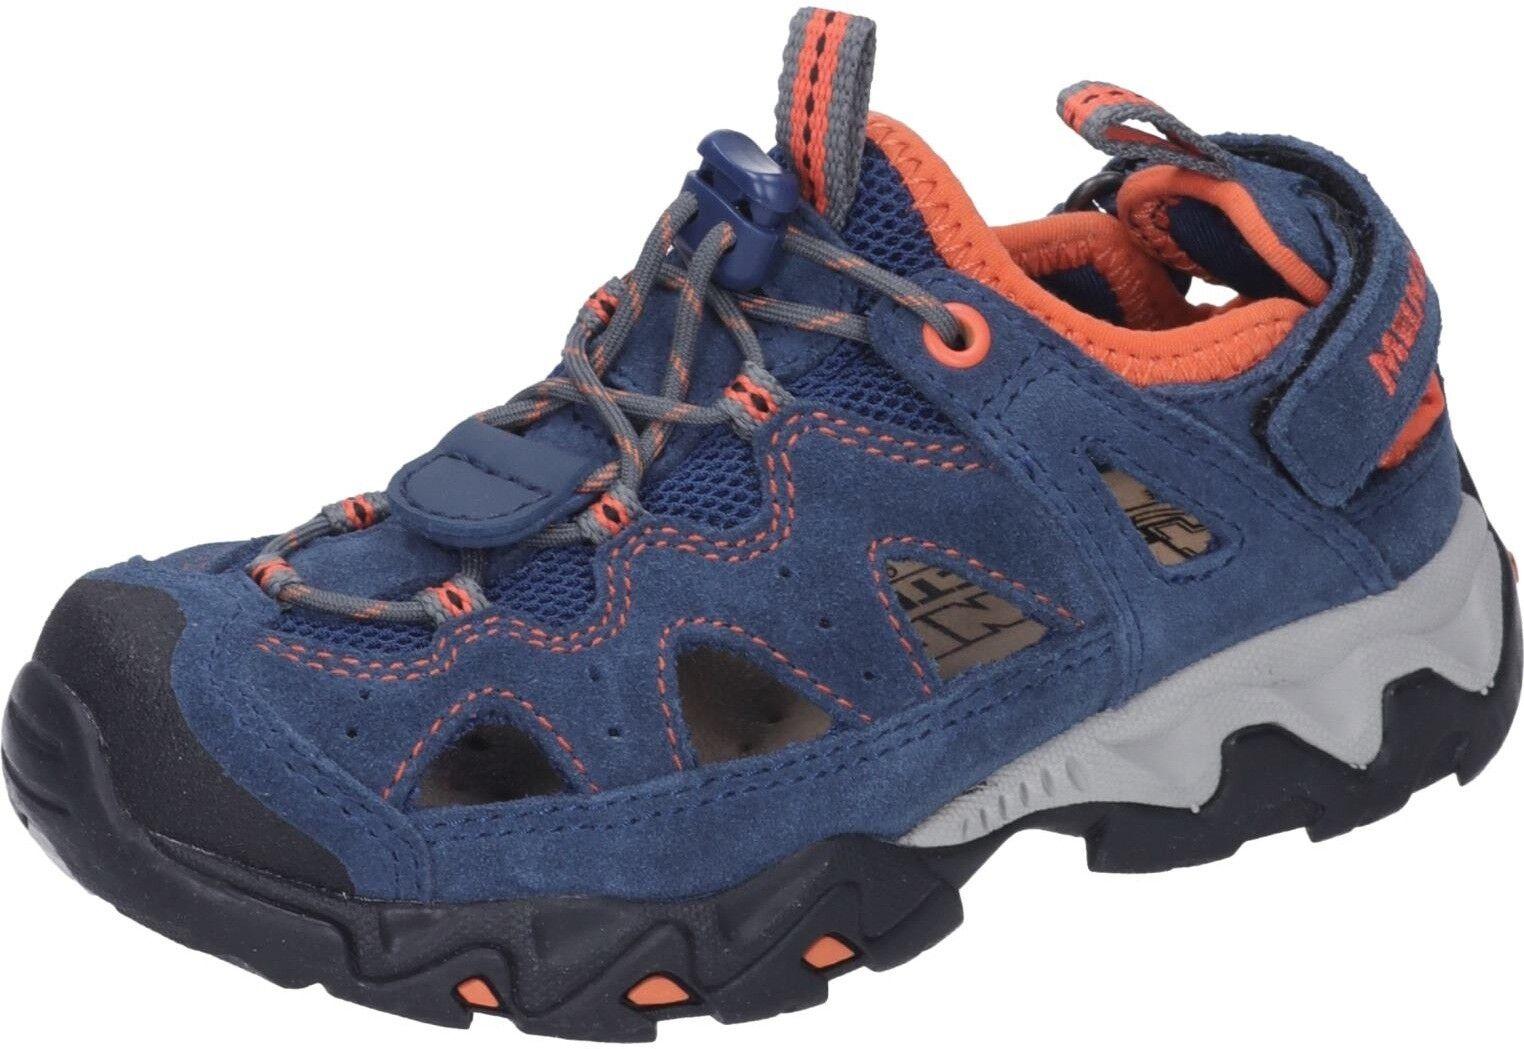 Meindl-Kinder Kinder Schuhe Rudy Junior blau Veloursleder NEU